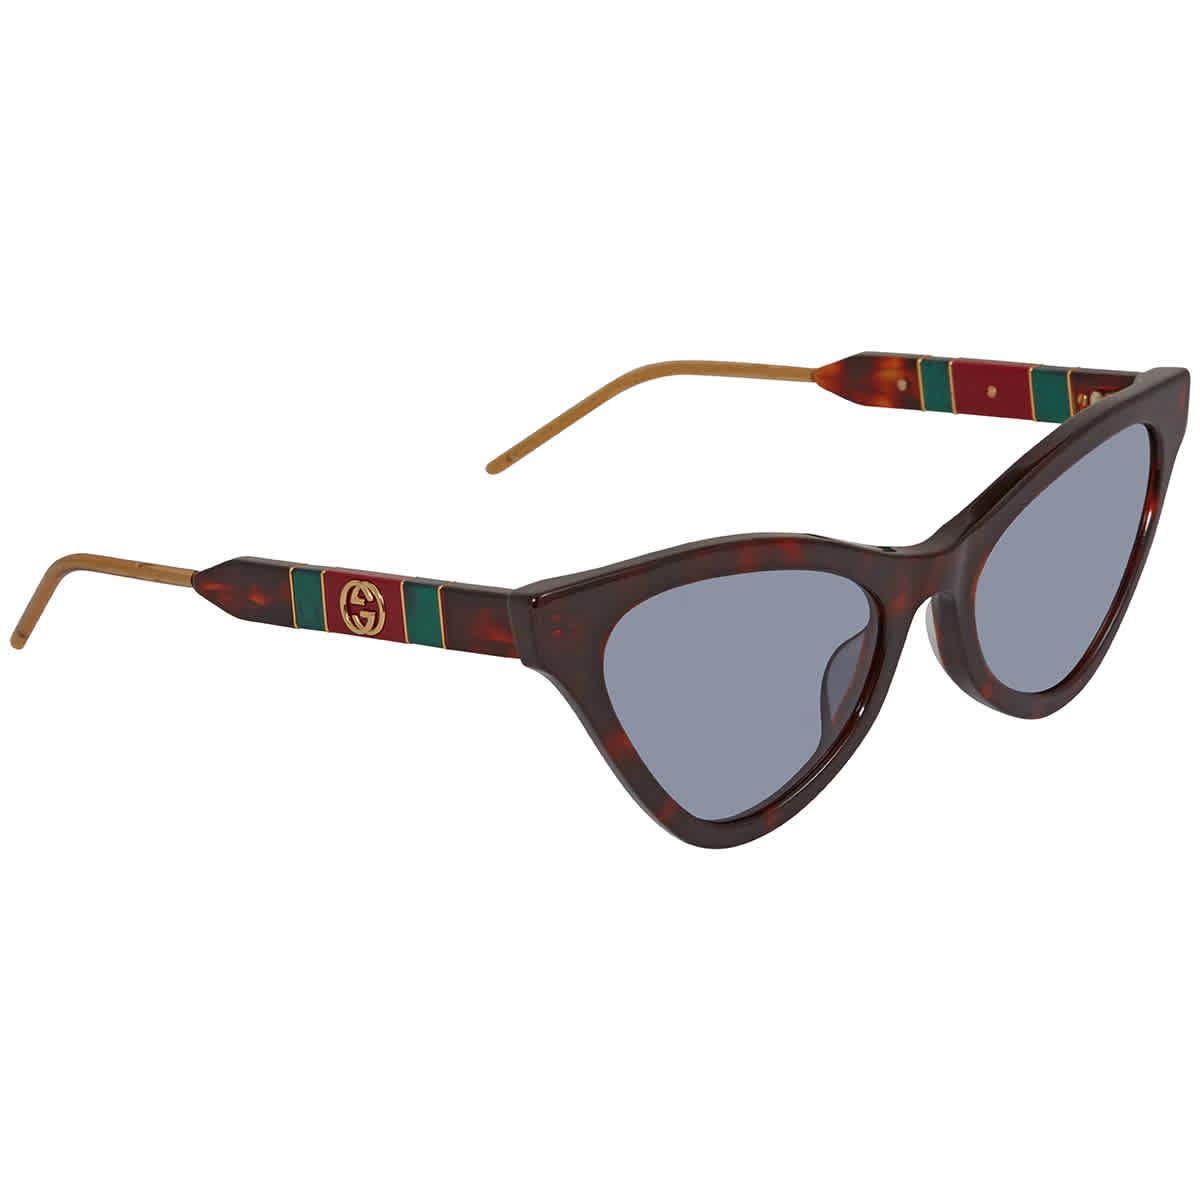 Gucci Blue Cat-eye Ladies Sunglasses Gg0597s-002 55